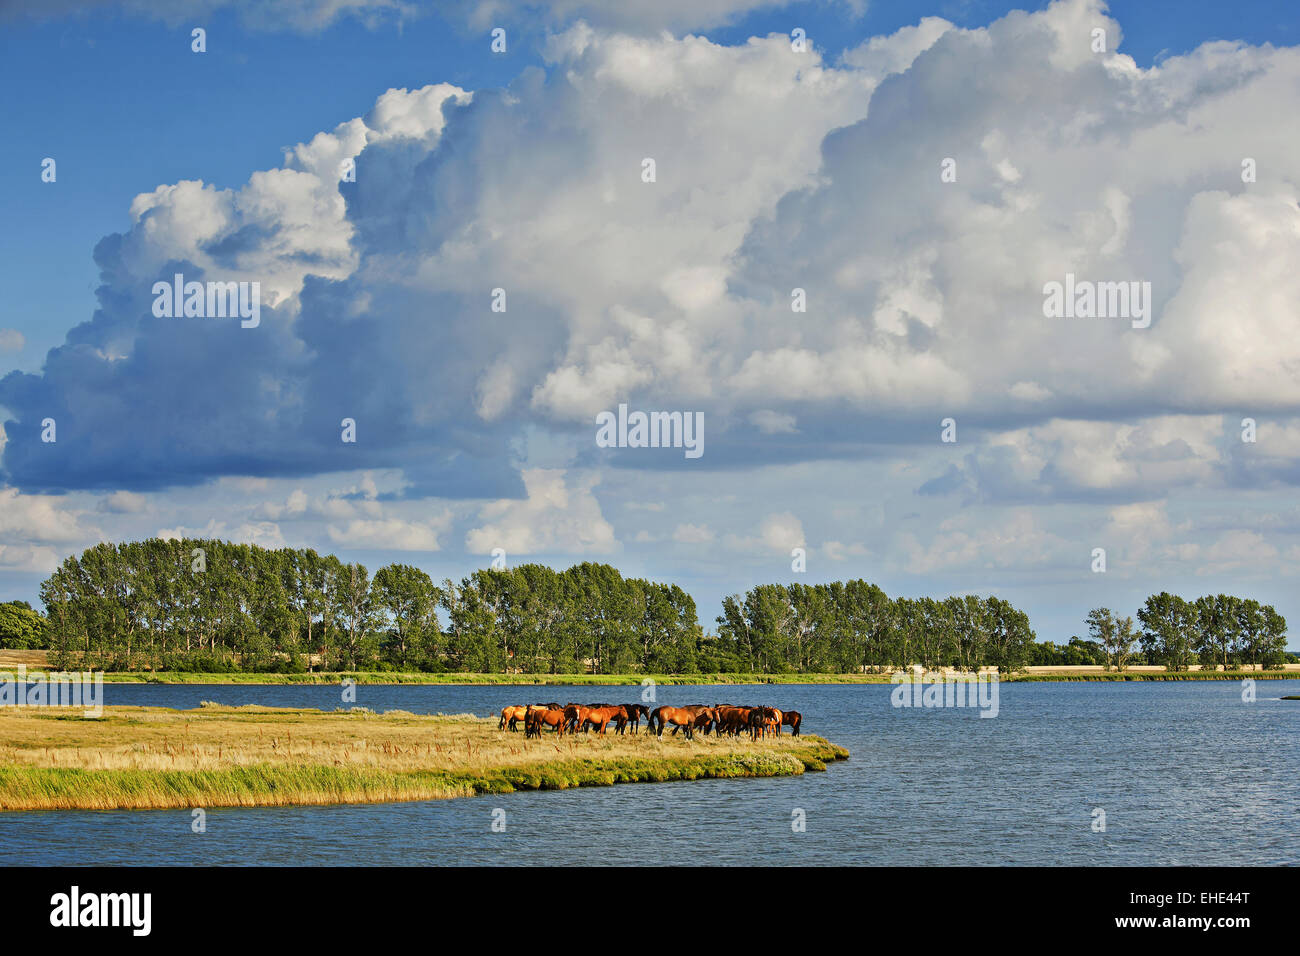 Poel island, Mecklenburg-Vorpommern, Germany - Stock Image